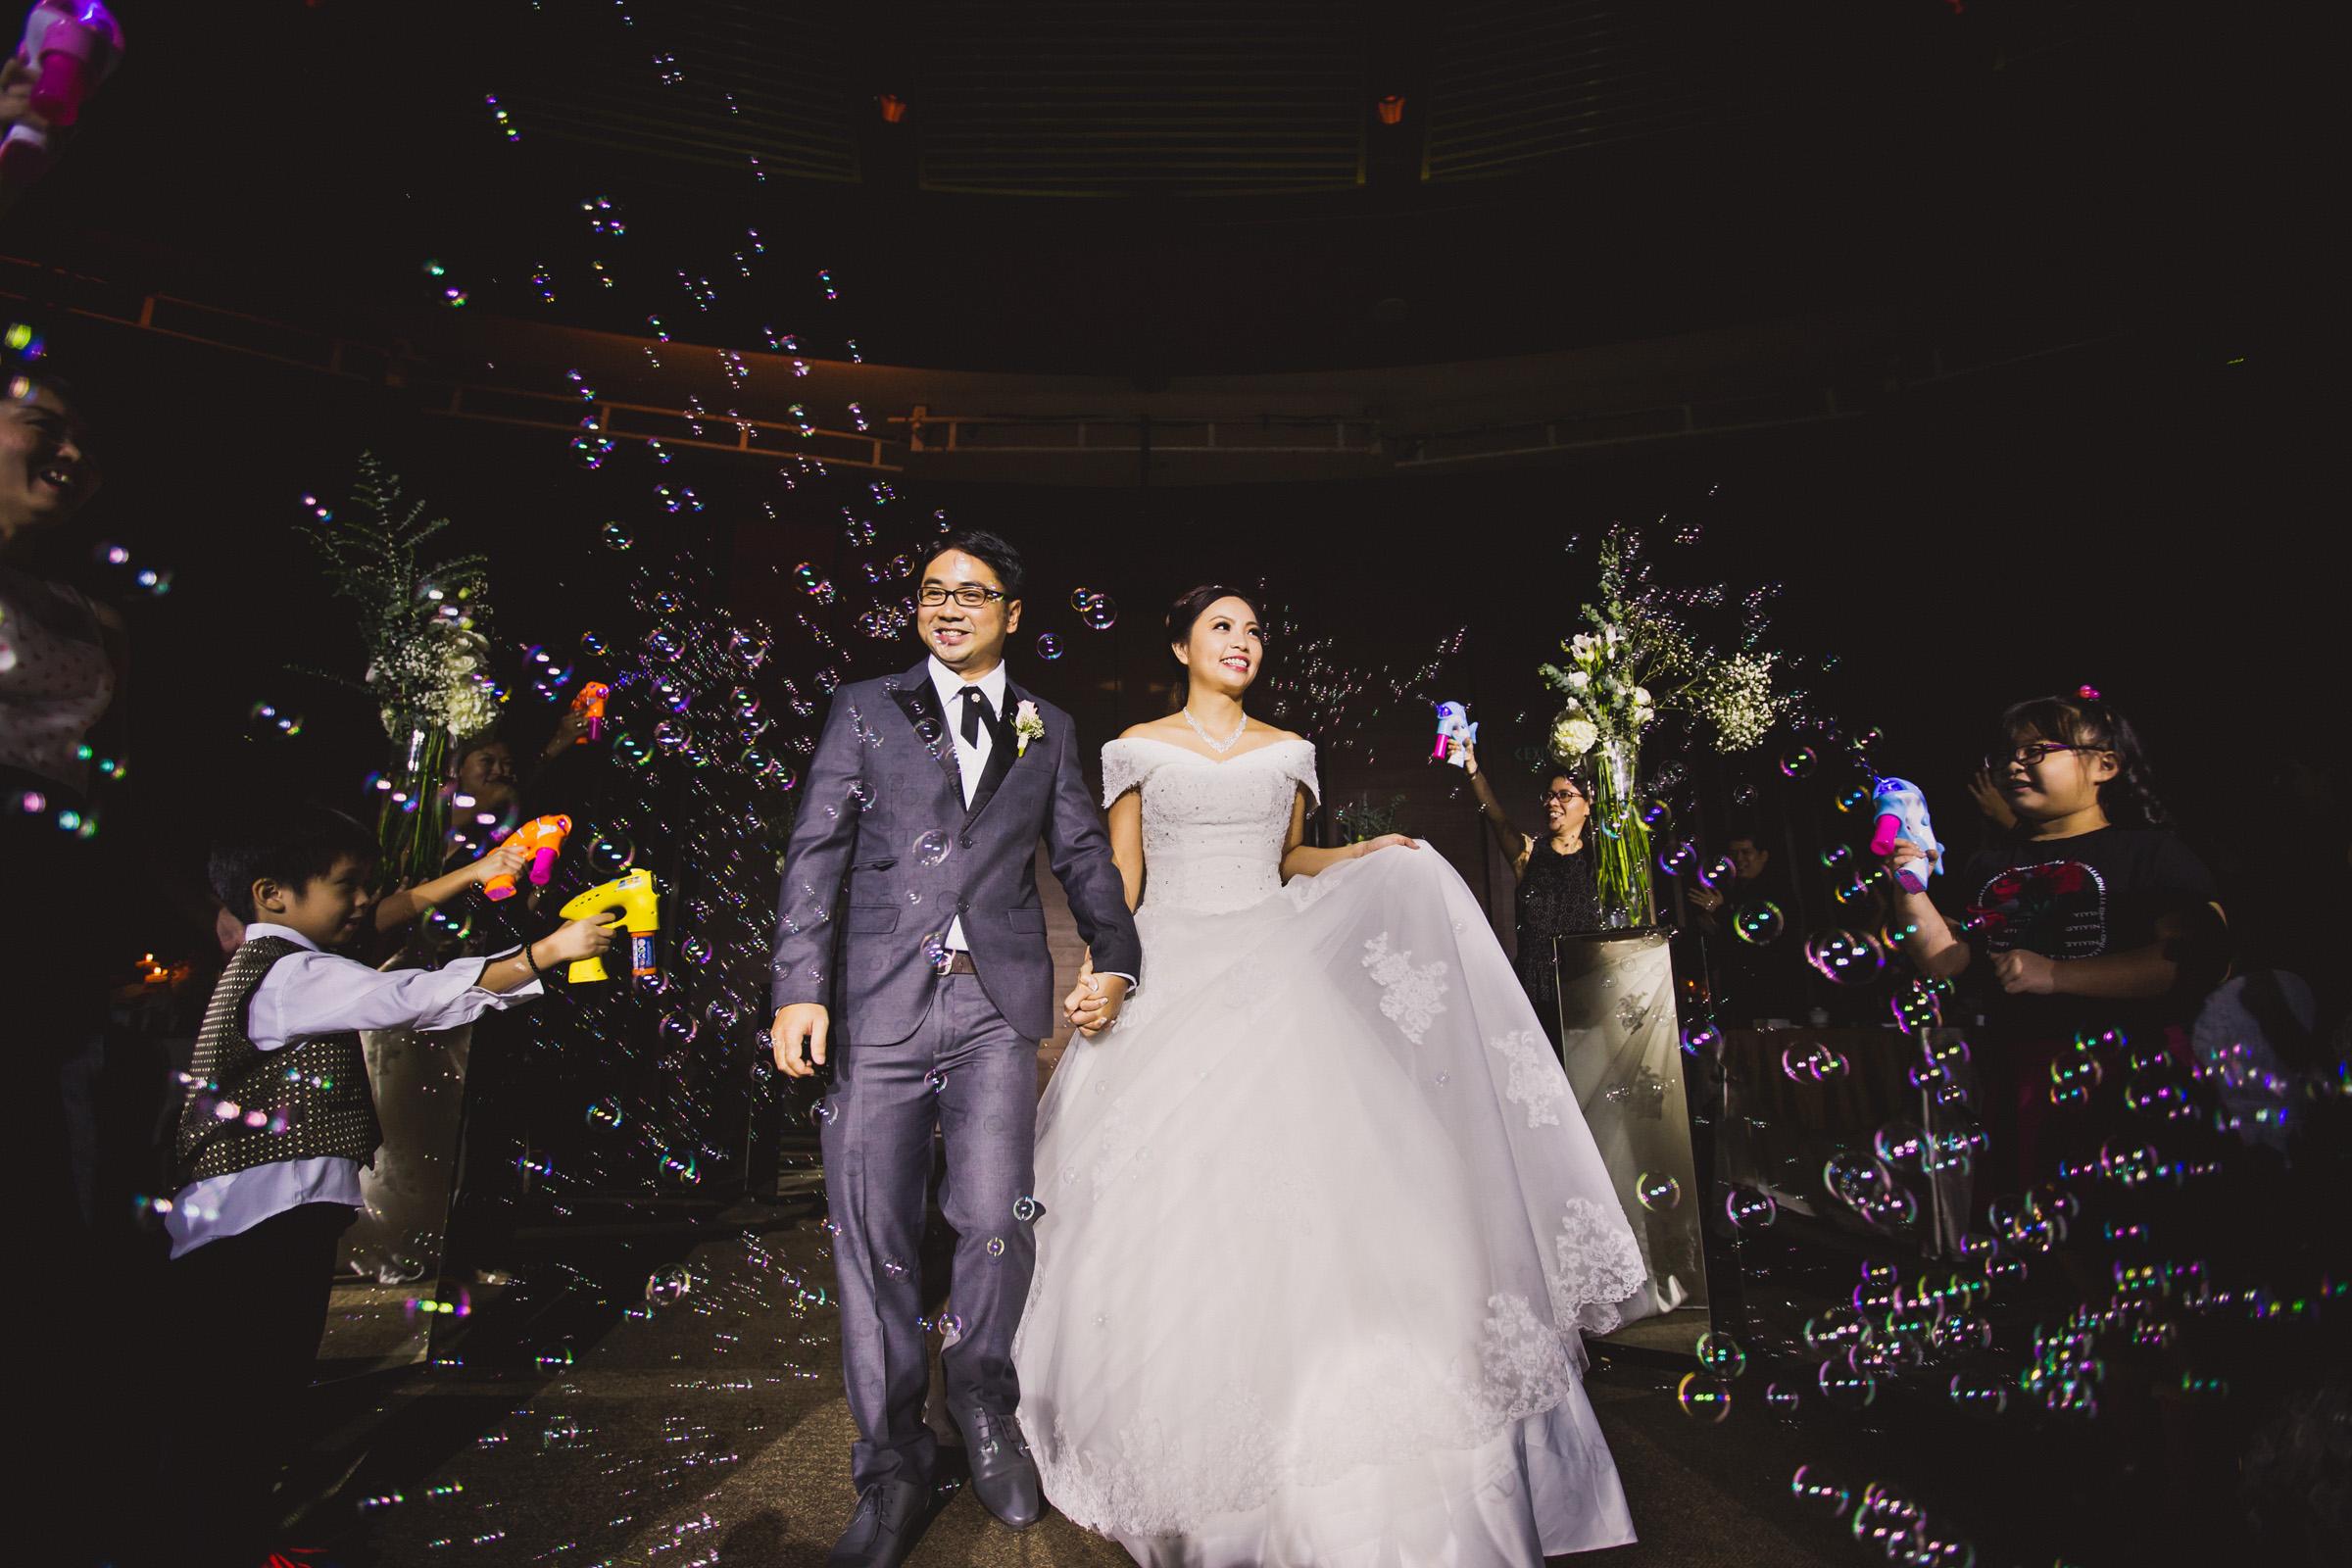 Steven_Jasmine_Wedding_Walldrobe Photography_Wedding shoots_Actual day wedding_Photographer (37)